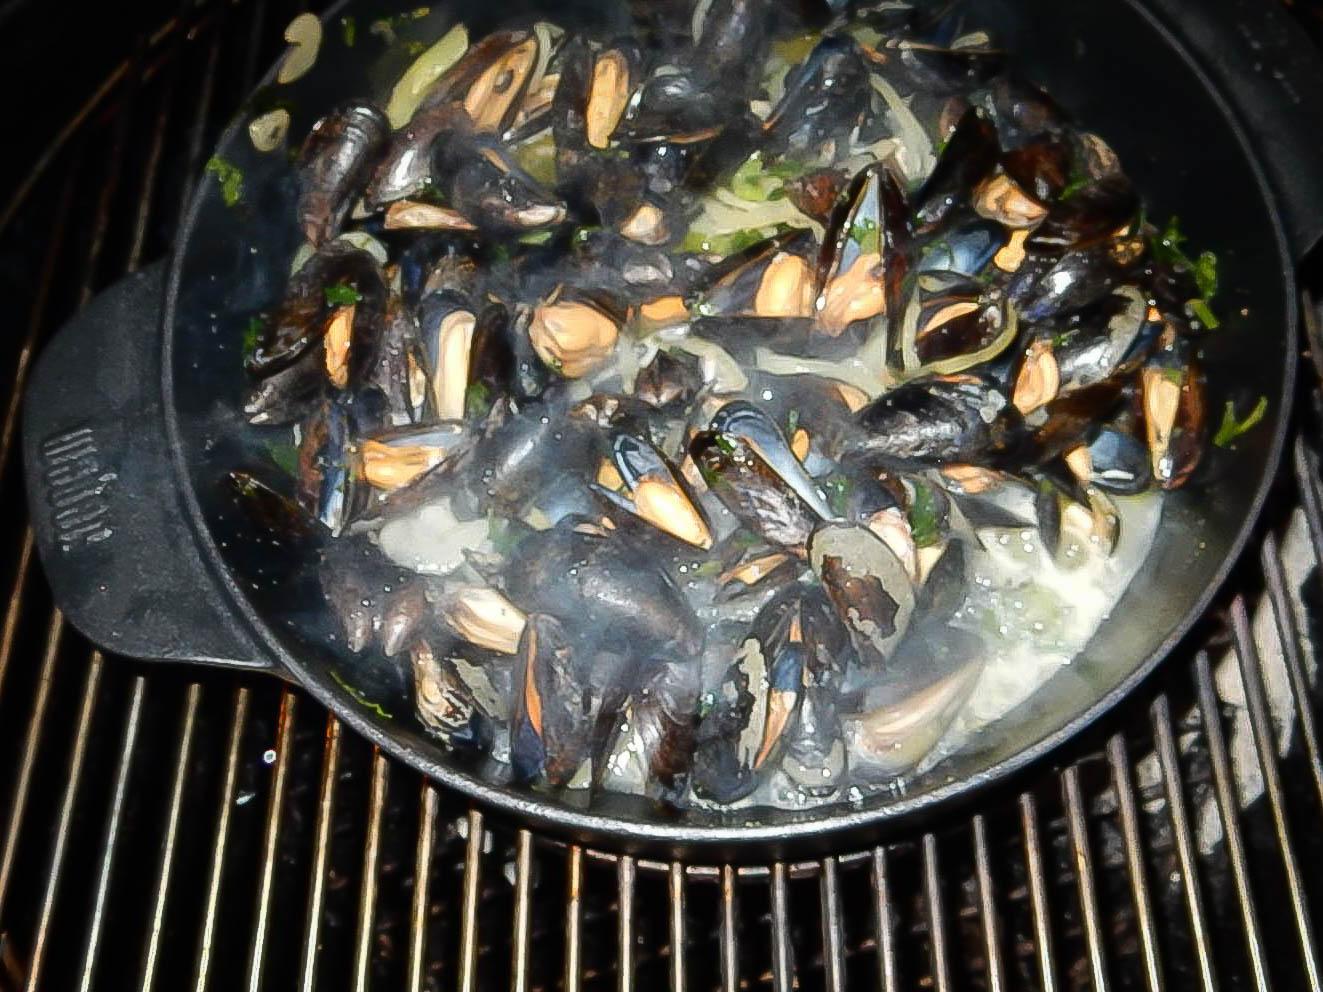 Urthel Saisonière Mussels by Birger Allary